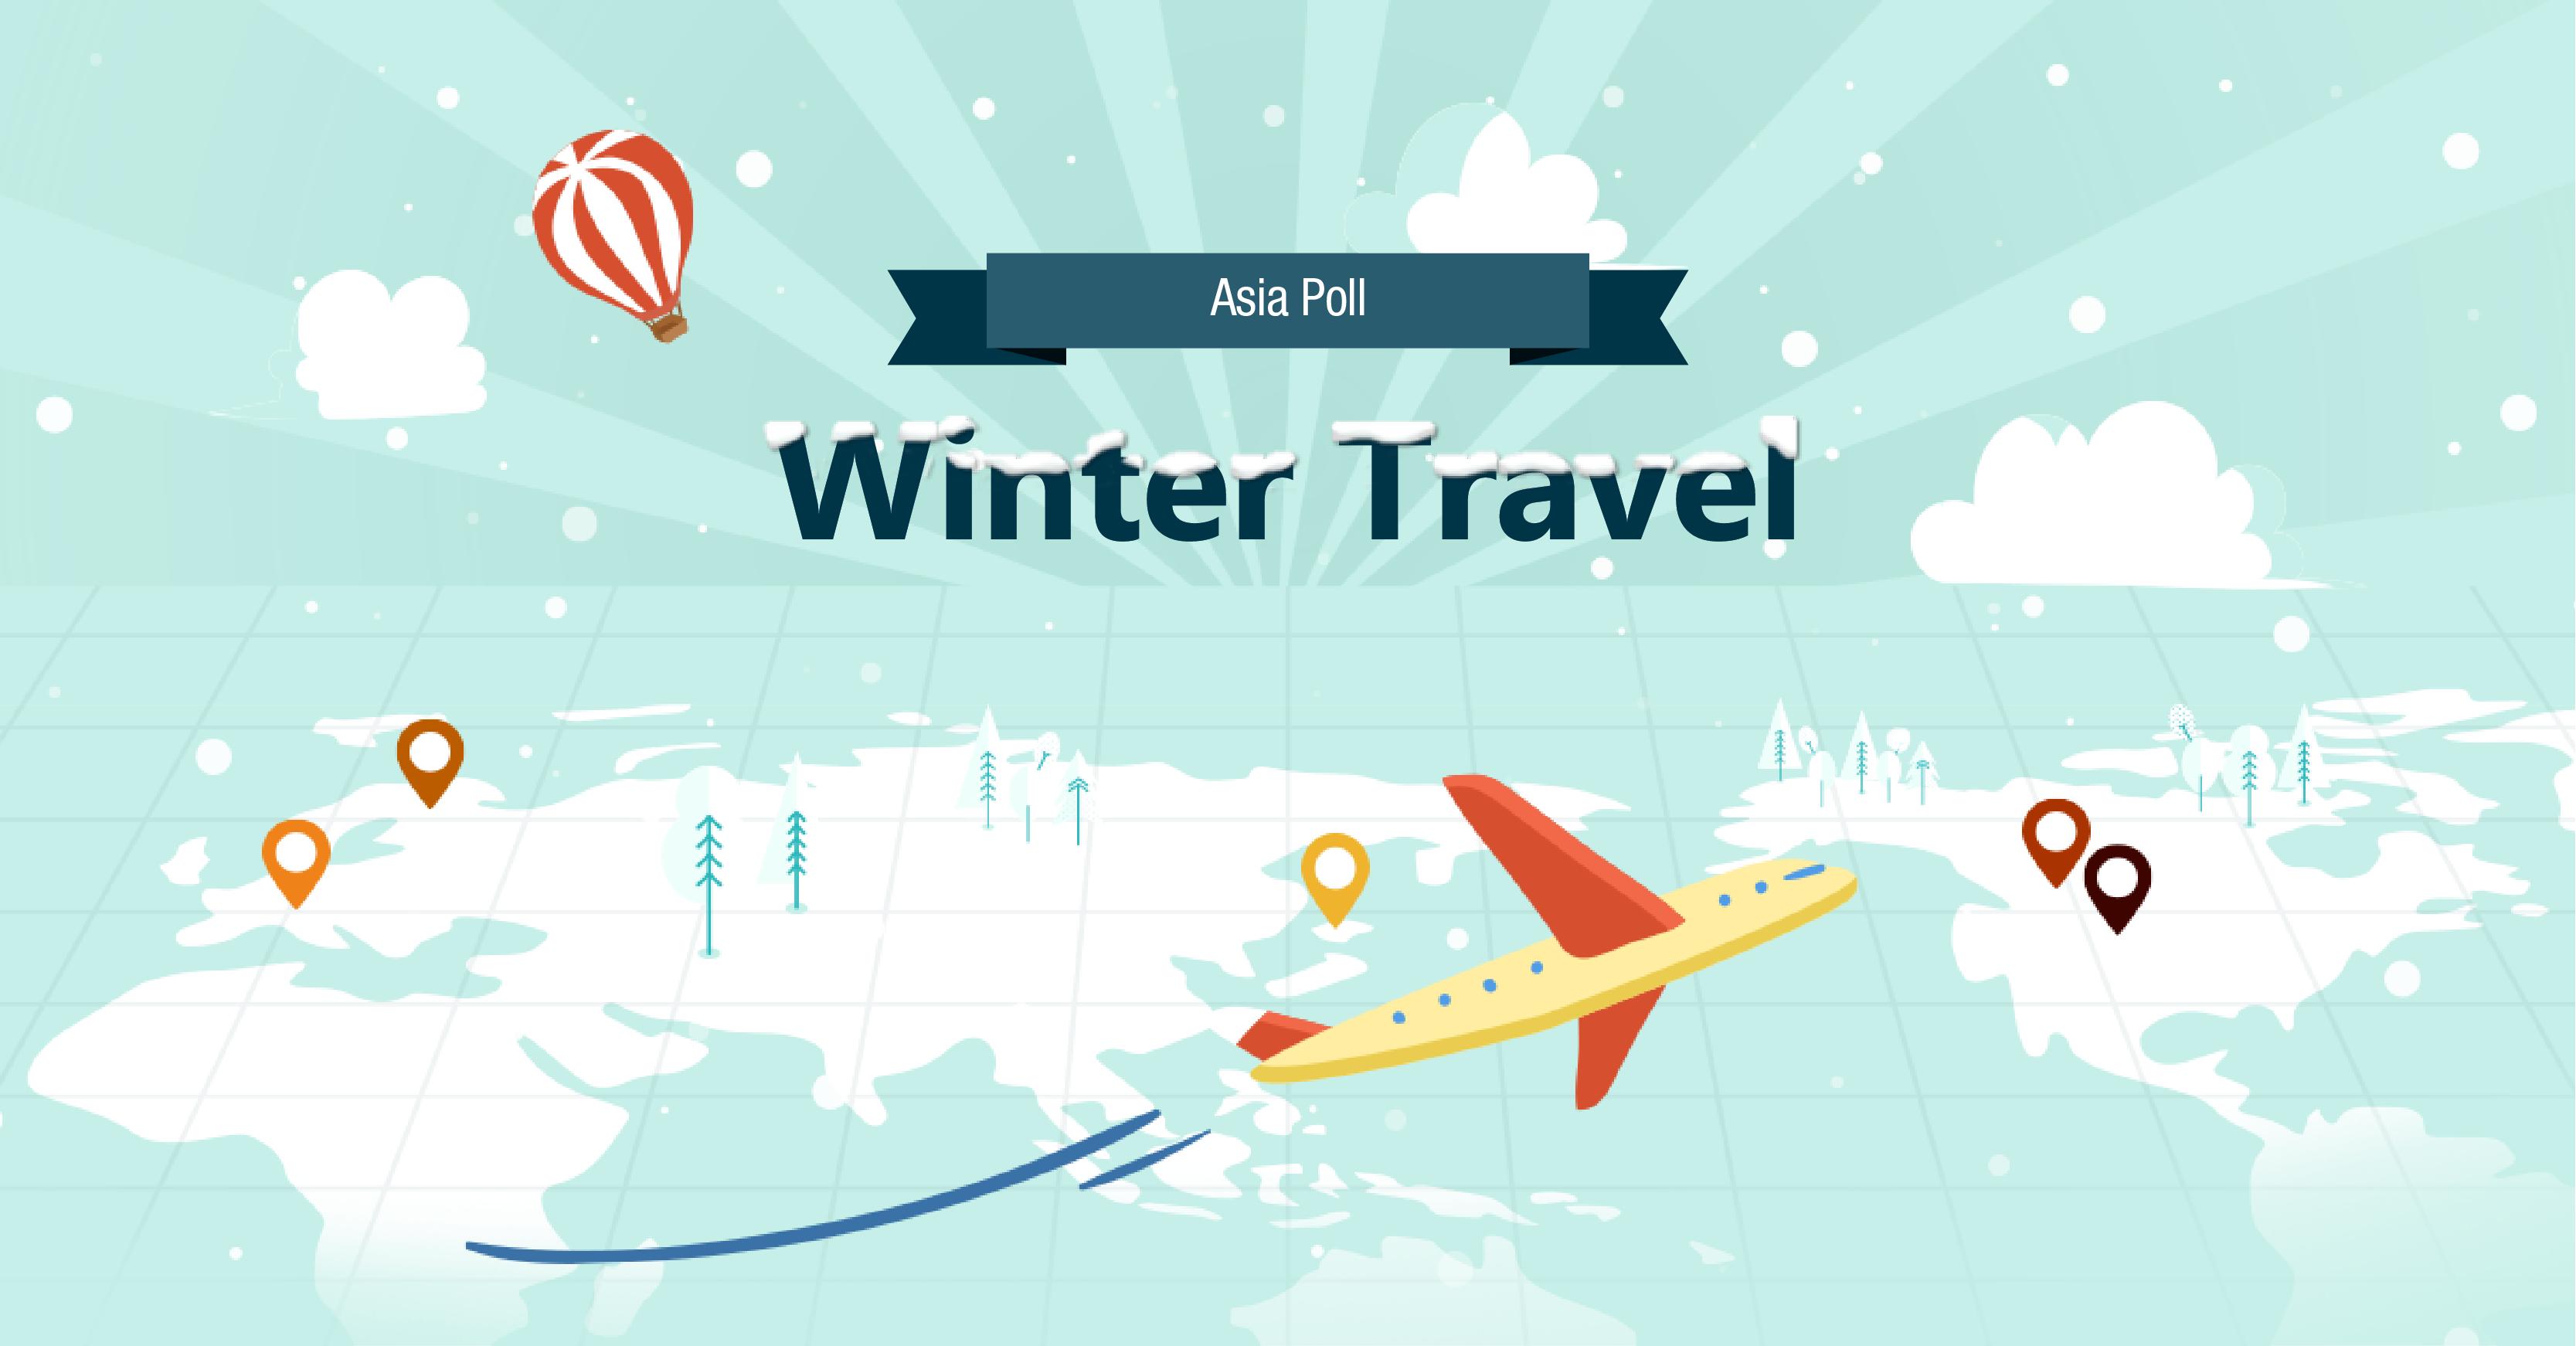 Winter travel report